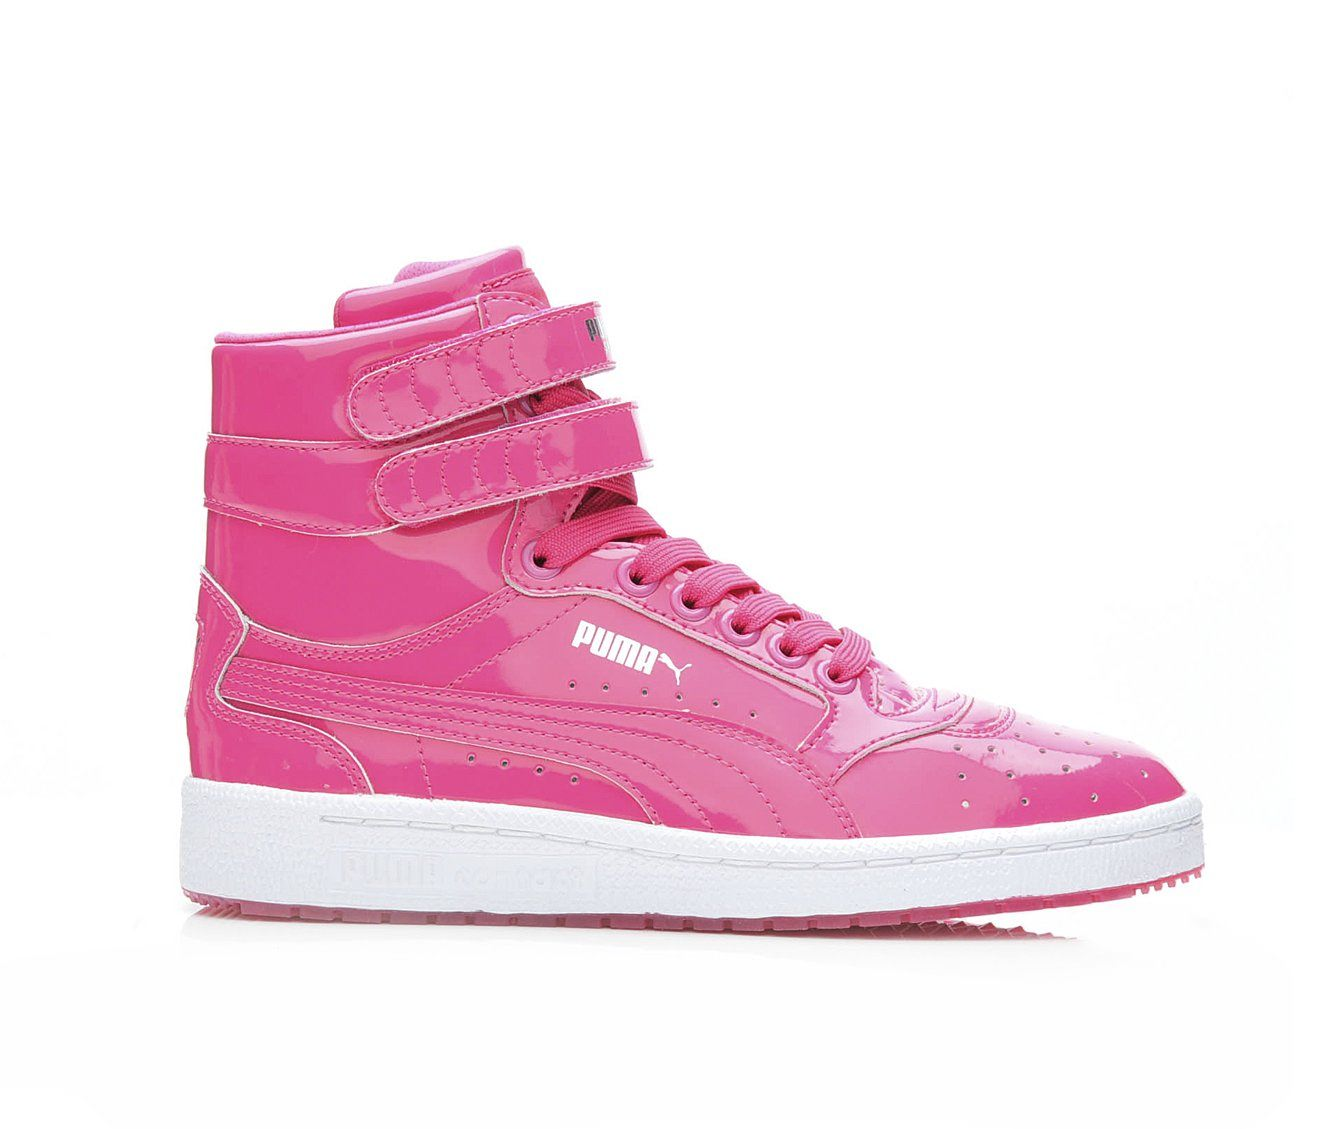 Girls' Puma Sky II Hi Patent Sneakers (Pink)